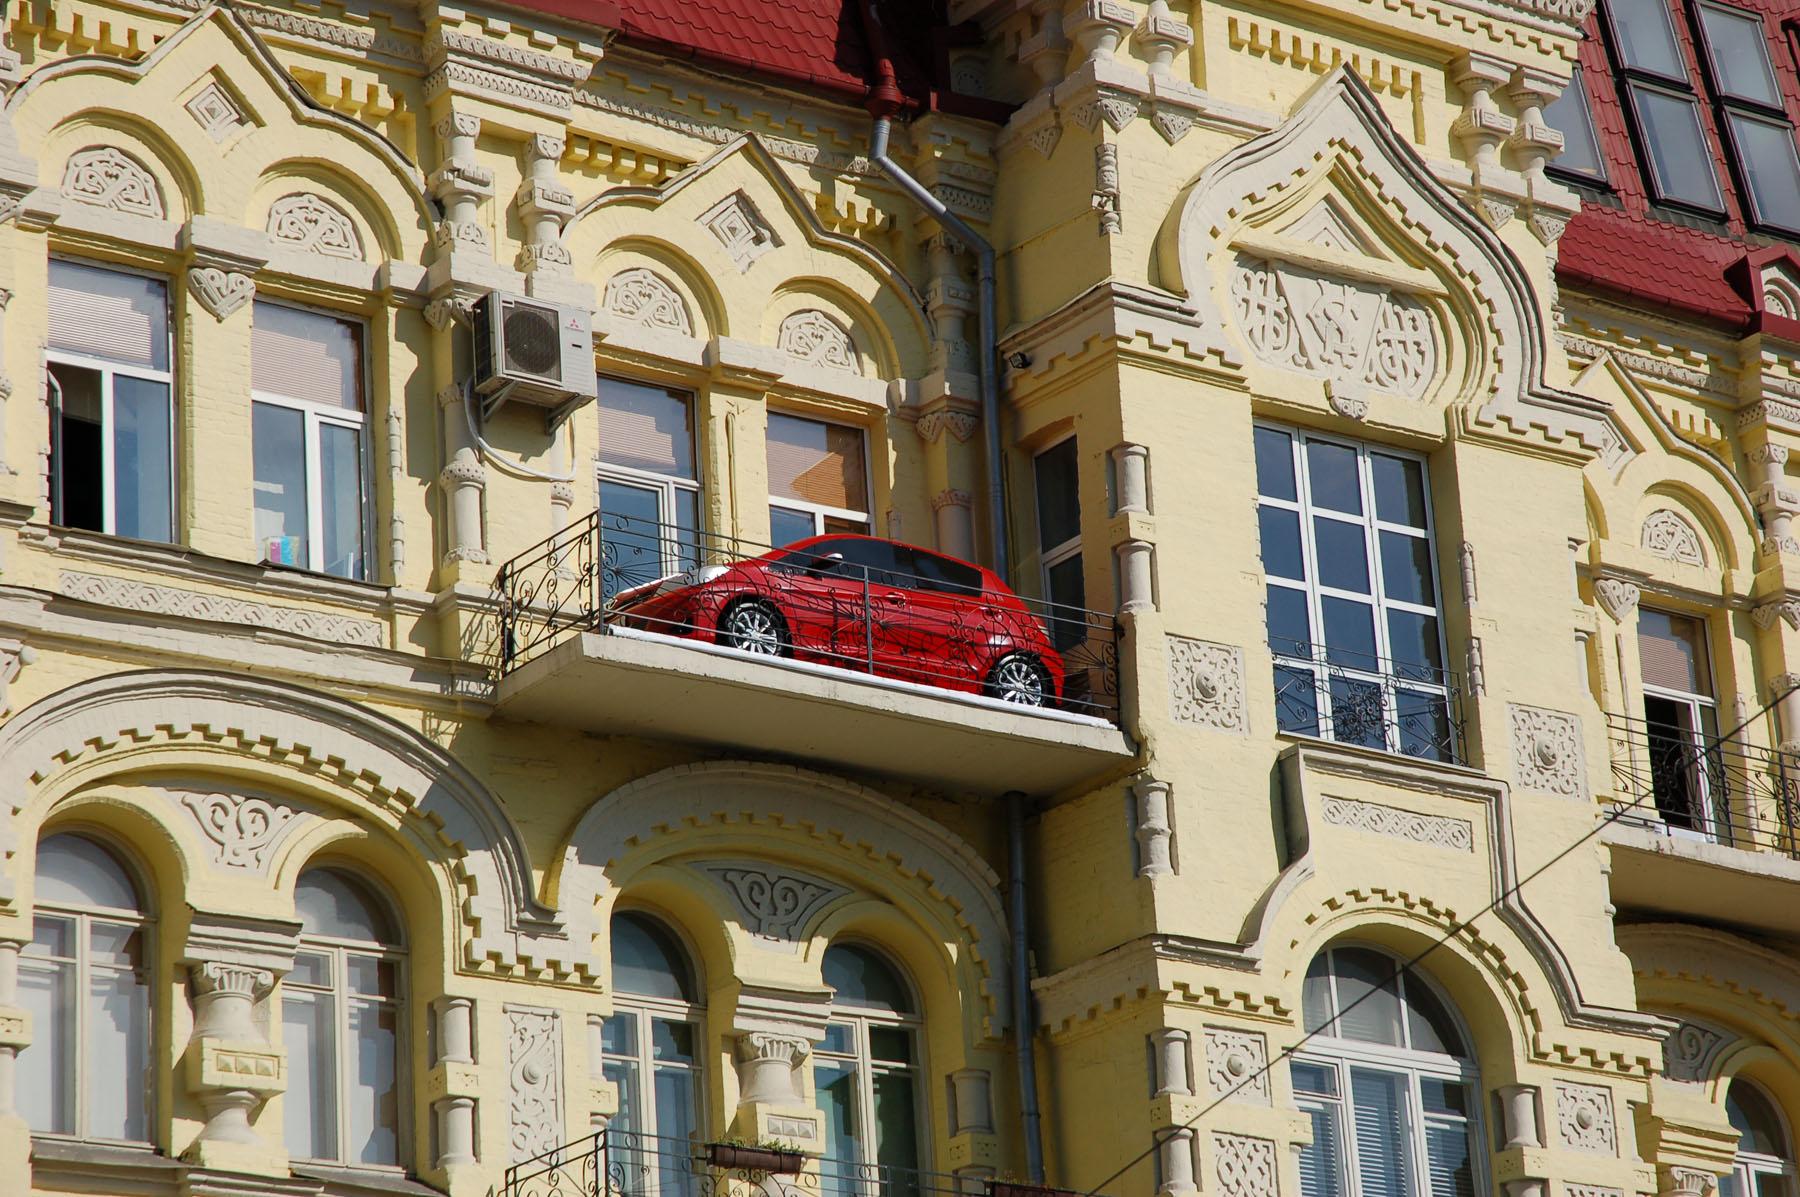 Еще один вид малого бизнеса — реклама на балконах